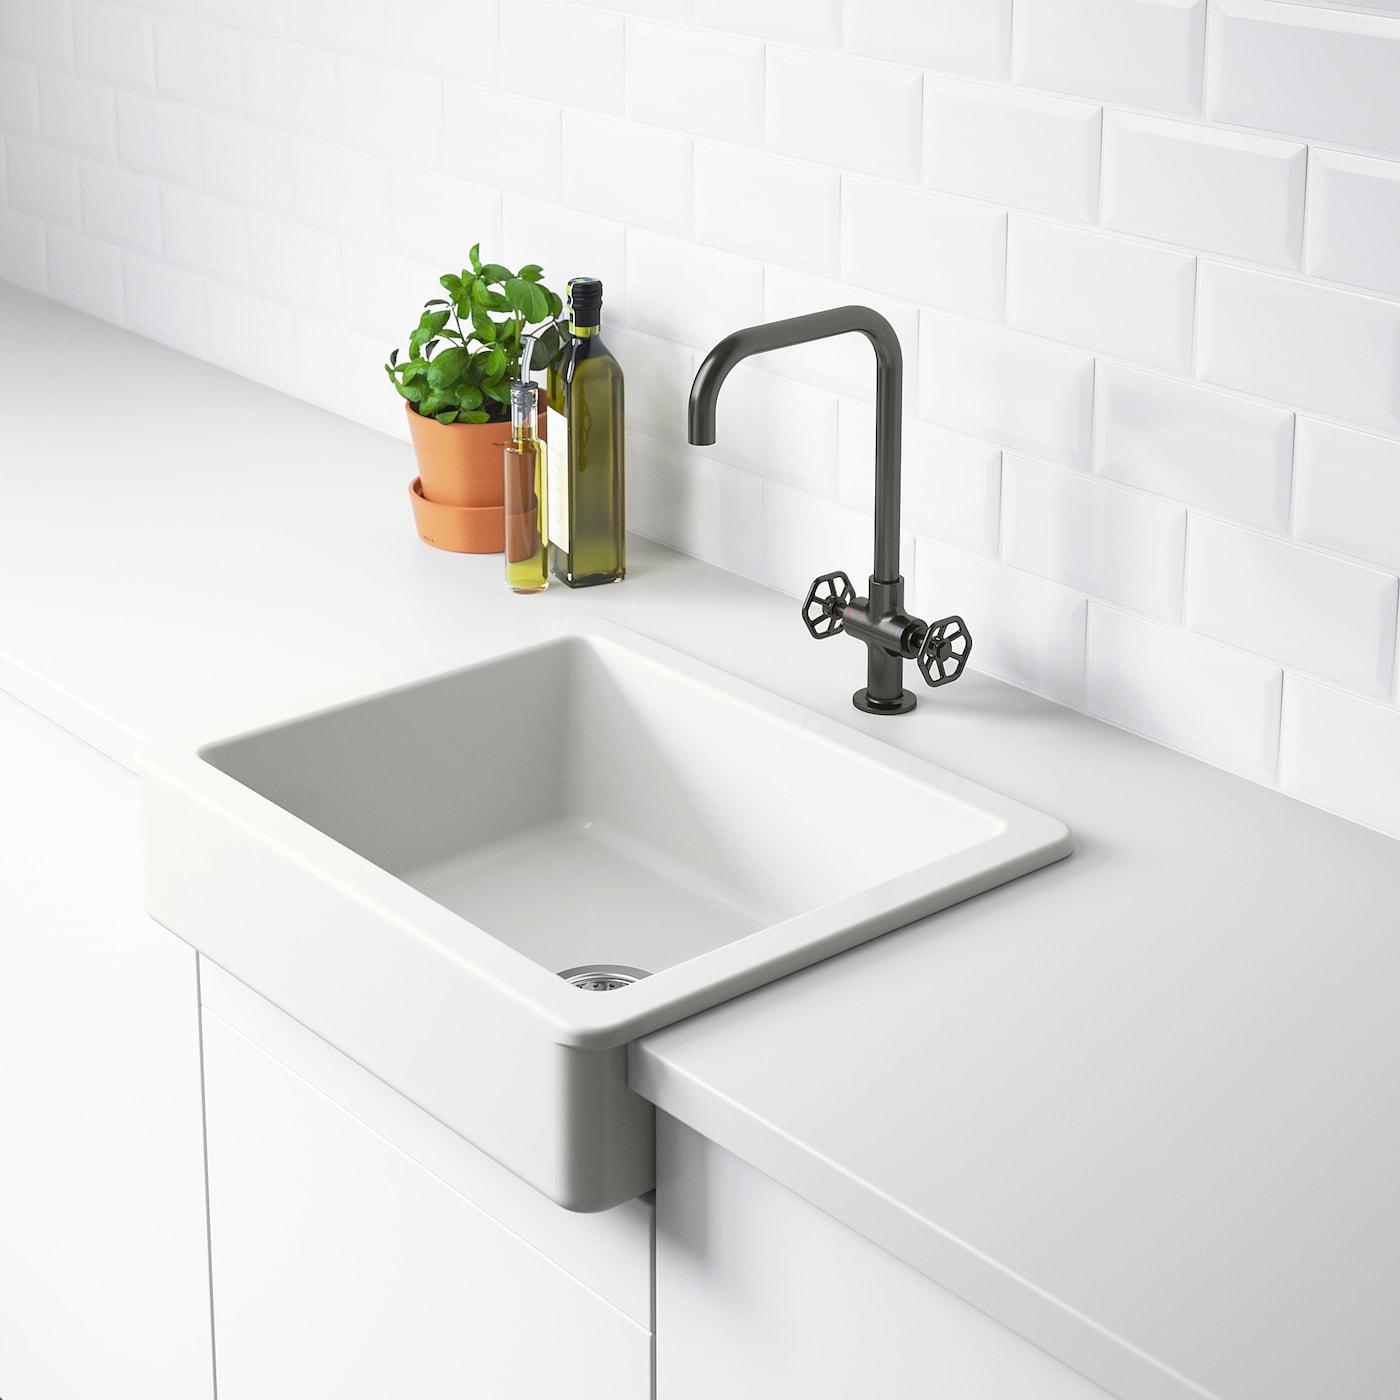 IKEA 792.537.25 Sink White